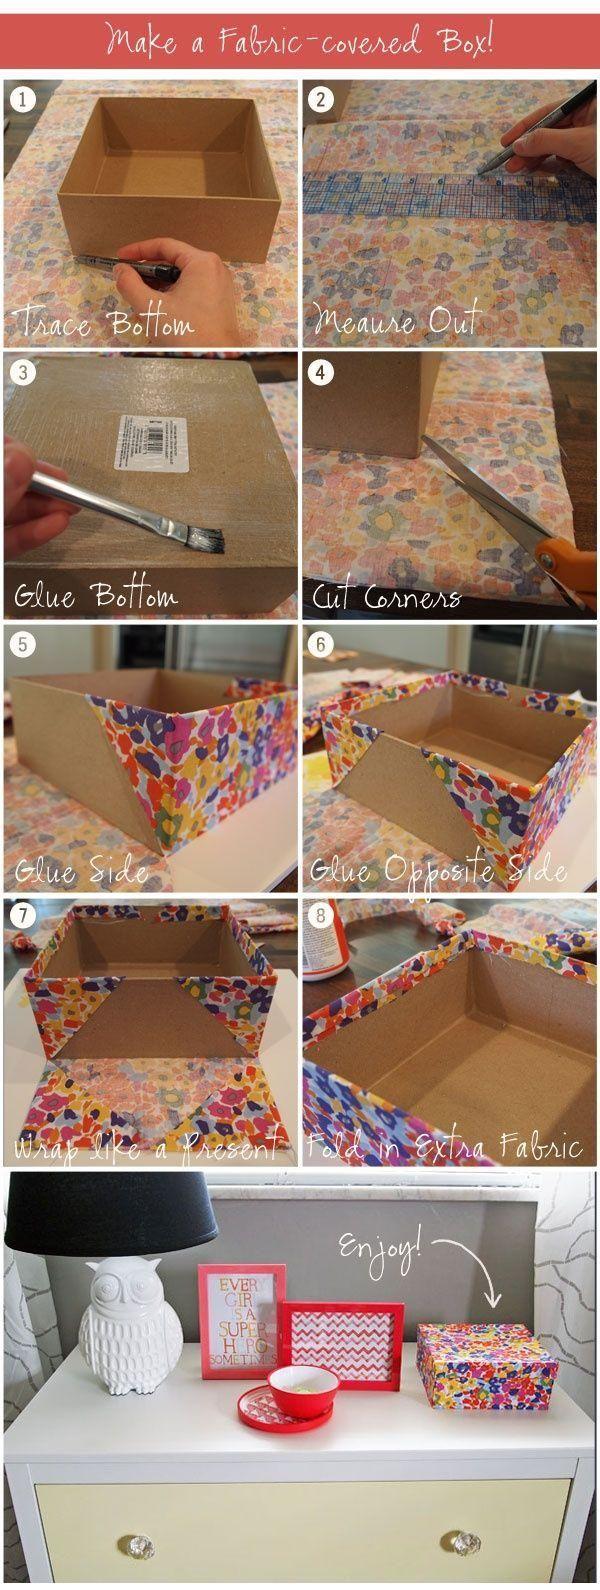 Make a Fabric-covered Box!